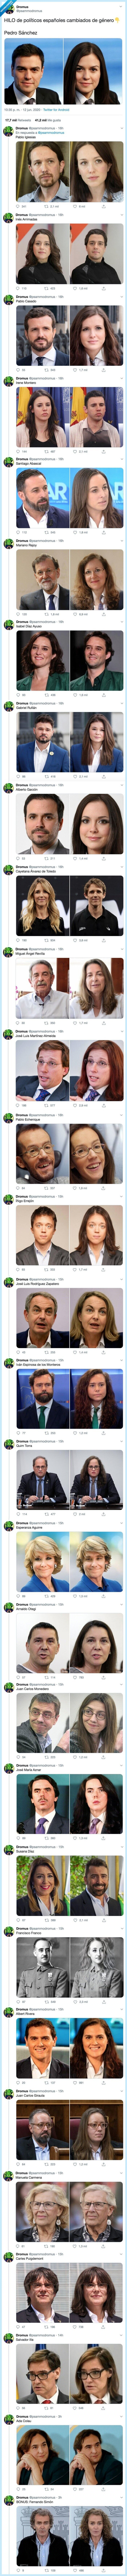 cambiados,españoles,género,políticos